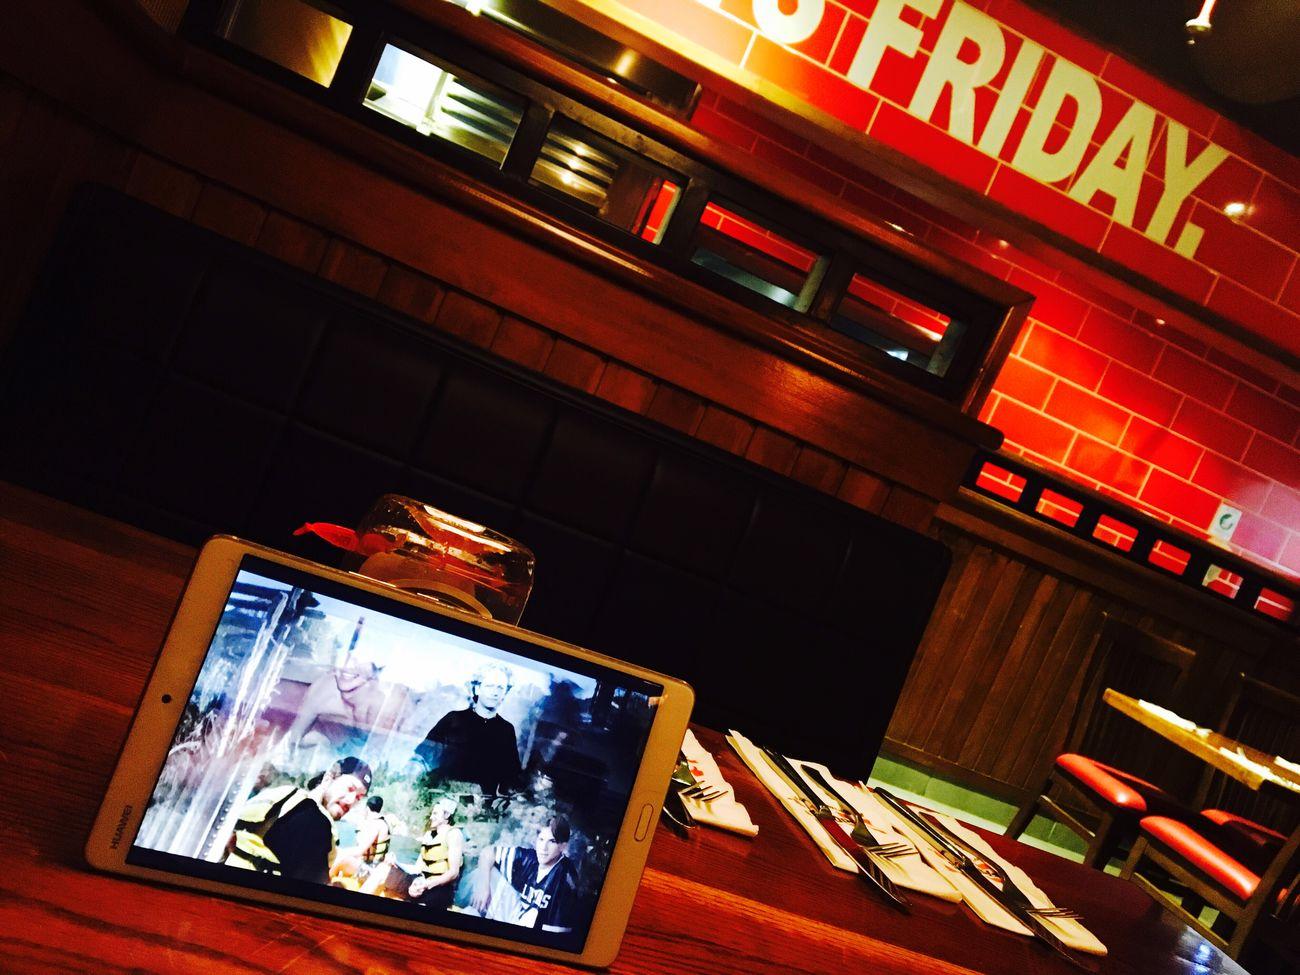 The Ranch Netflix❤✌ Netflix Watching A Movie Watching It's Always Friday Friday Fridays T.G.I Fridays T.G.I.F